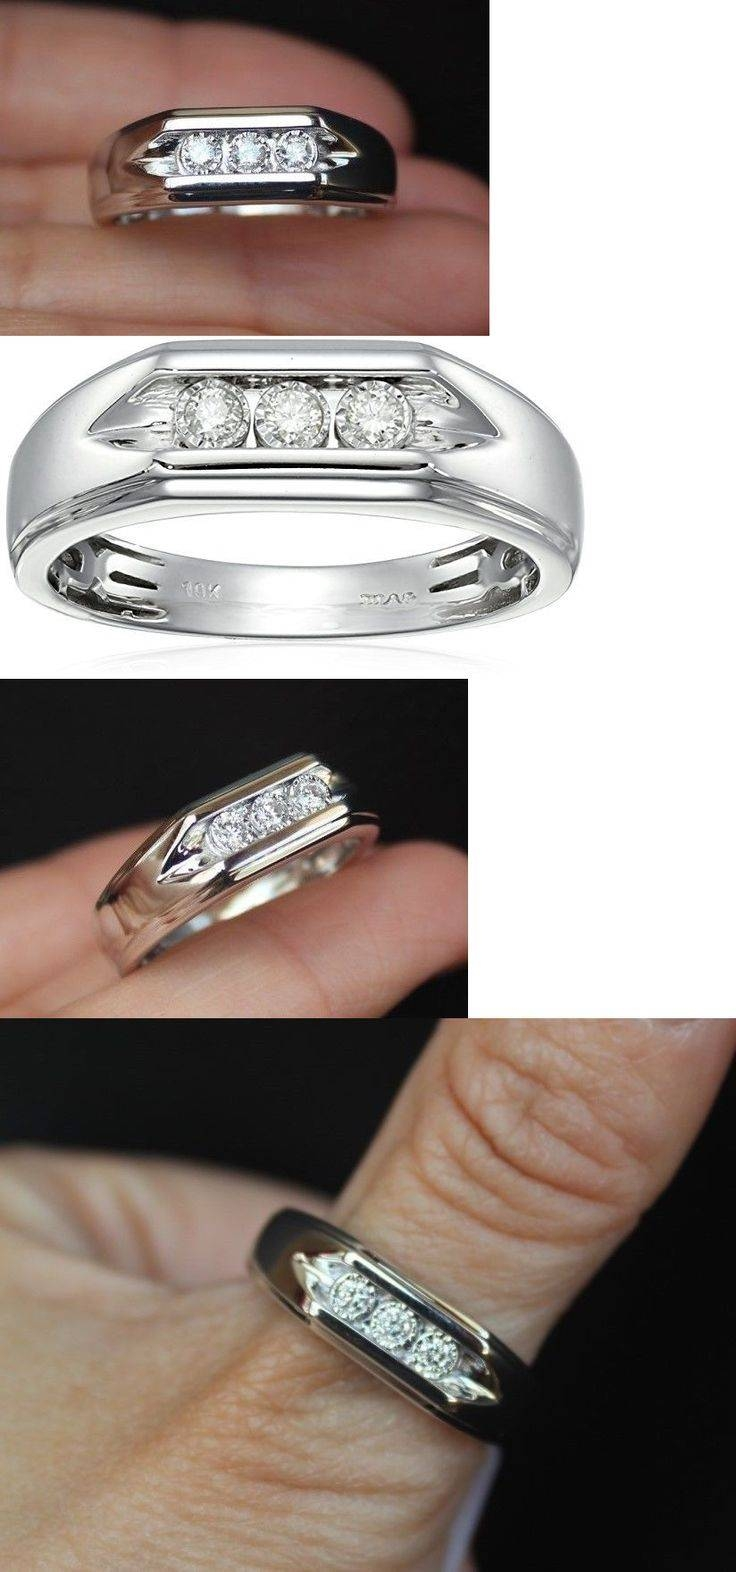 344 Best Men's Engagement Rings Images On Pinterest | Rings Intended For Men's Firefighter Wedding Bands (View 3 of 15)